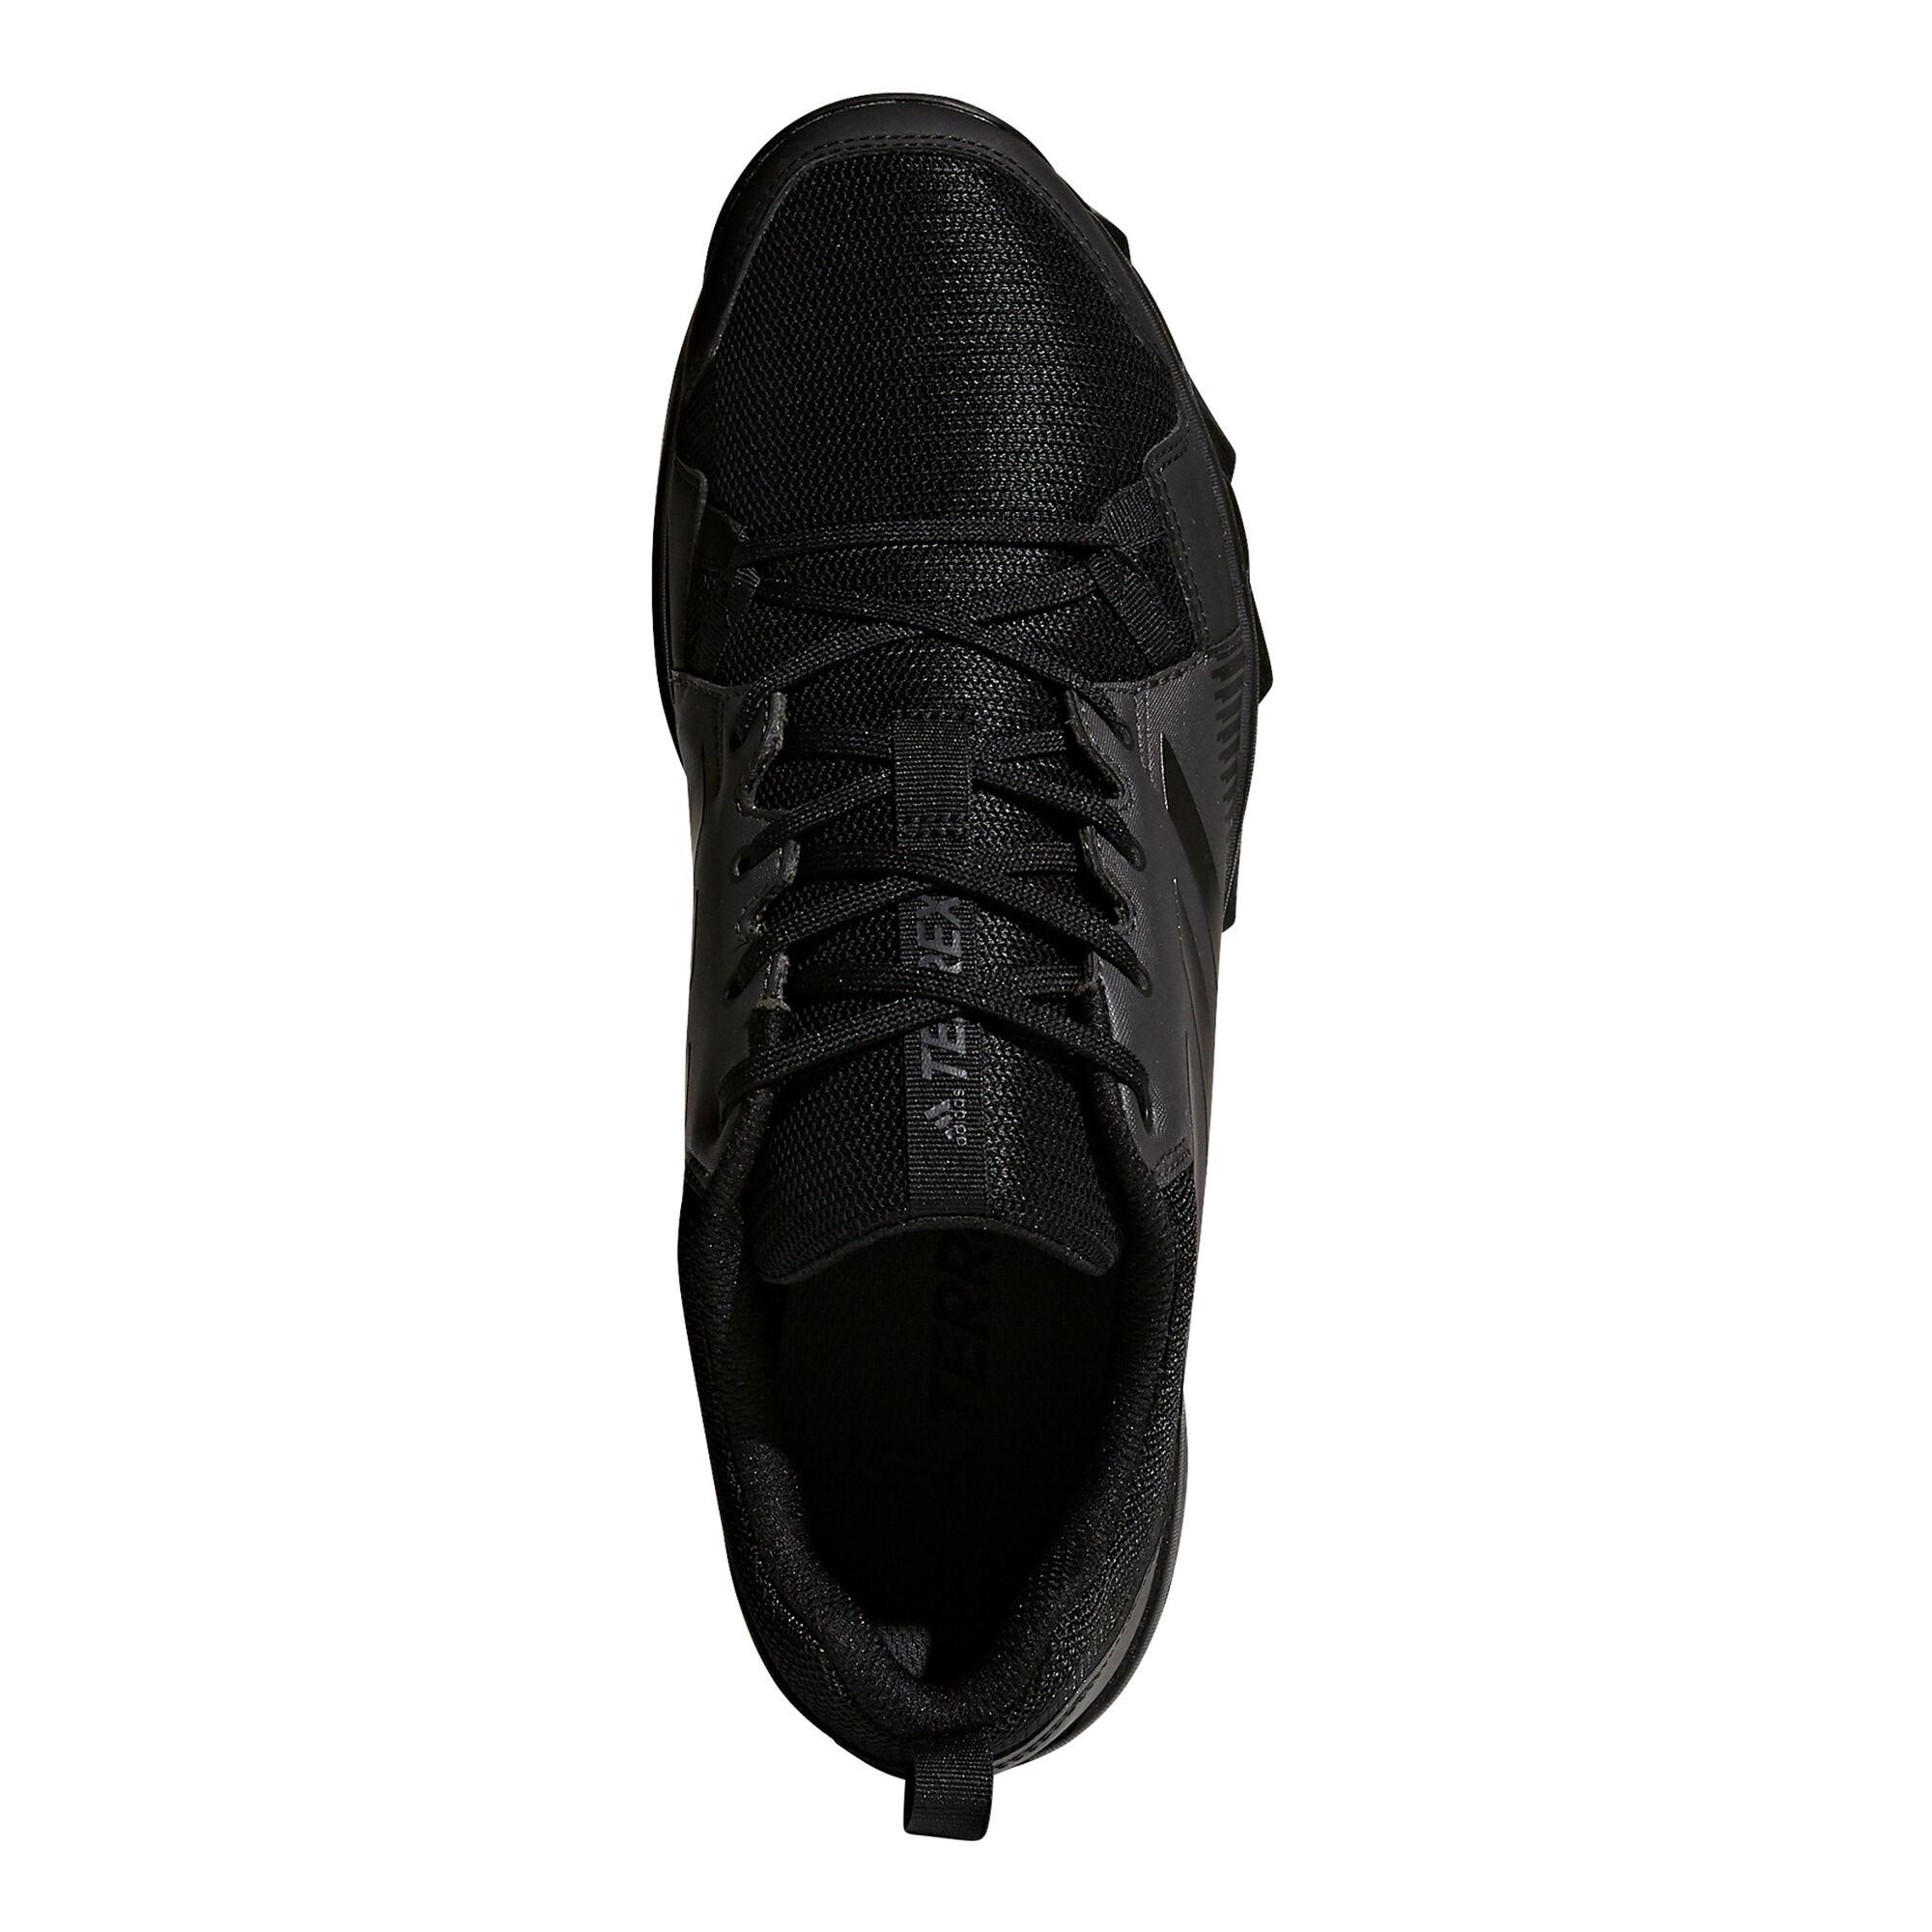 2e9bc241d16 adidas · adidas · adidas · adidas · adidas · adidas · adidas · adidas ·  adidas. Terrex Tracerocker Men ...